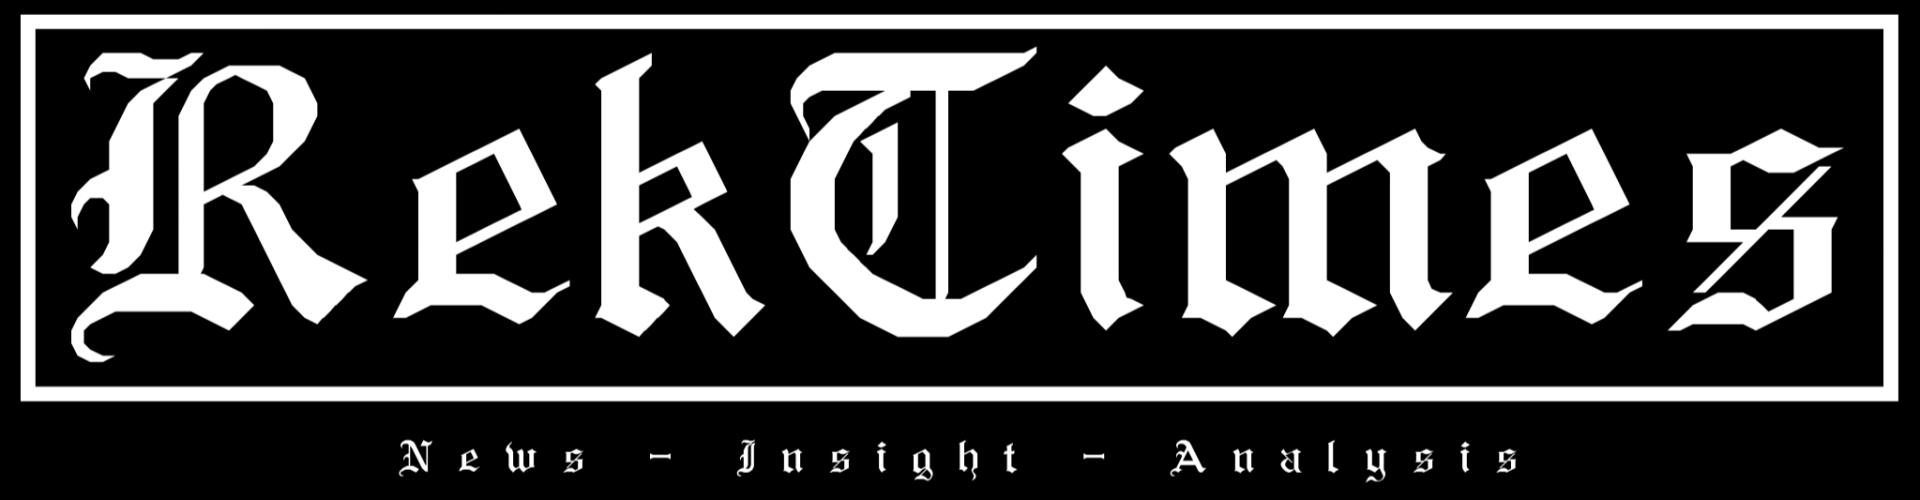 RekTimes - News, Insight, & Analysis